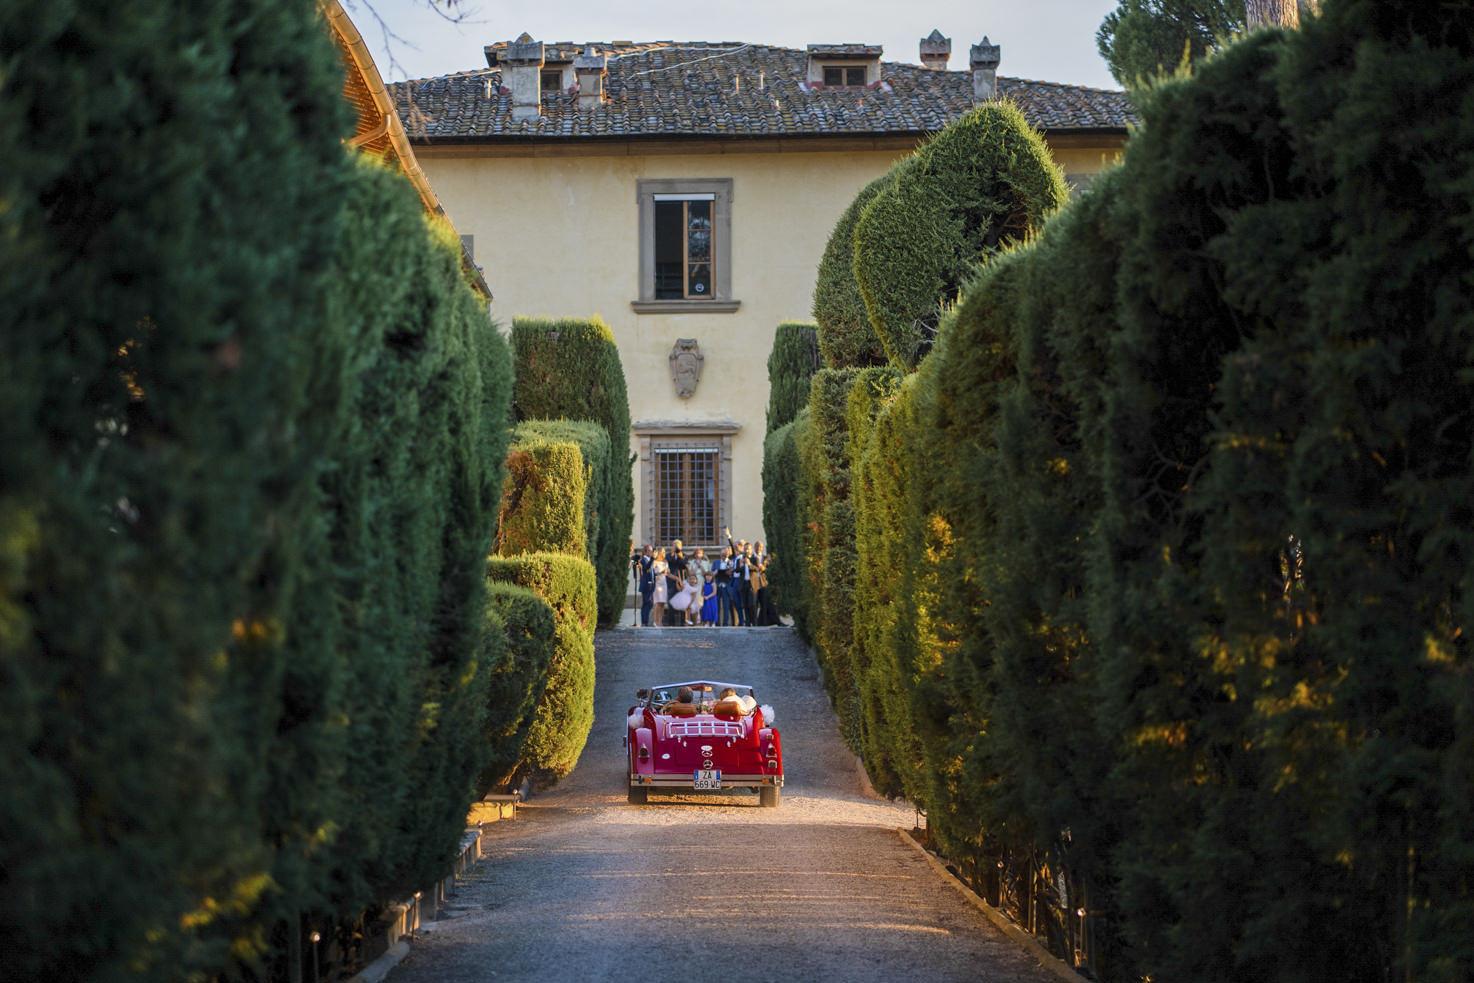 Arrival at Villa Gamberaia